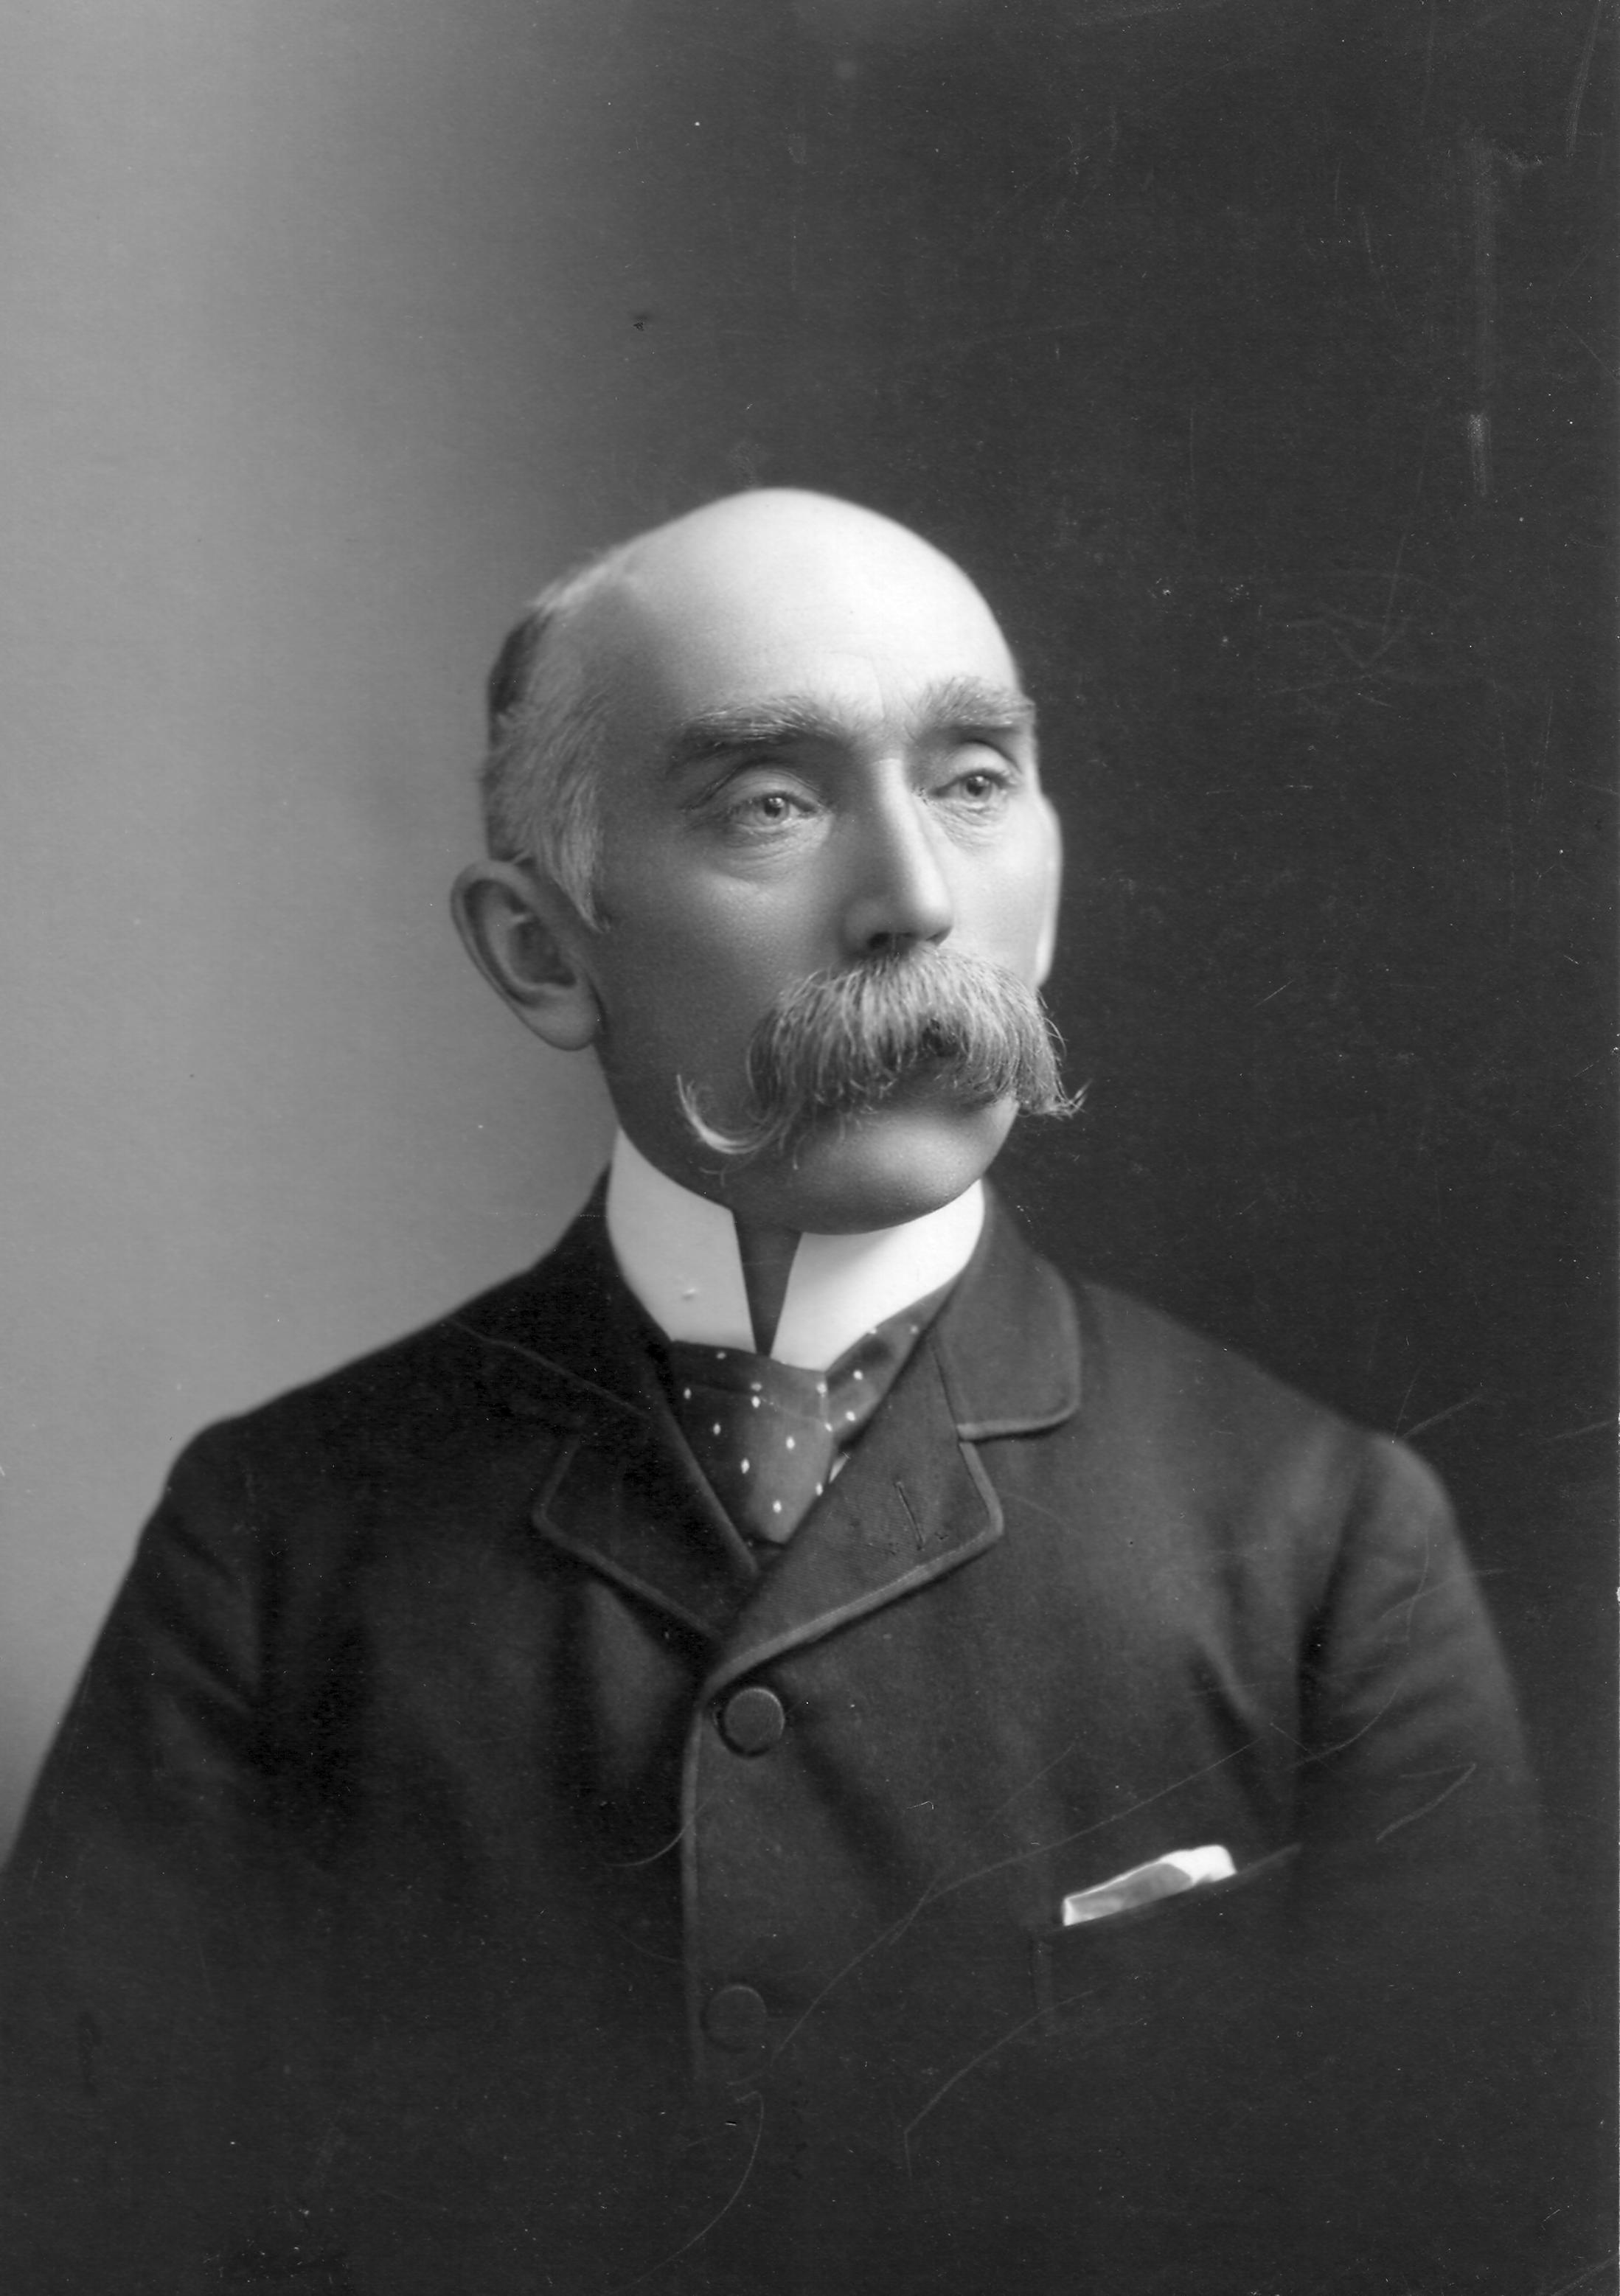 1899 portrait of Dr. Bryce by Lancefields of Ottawa. Photo courtesy of David G. Bryce.